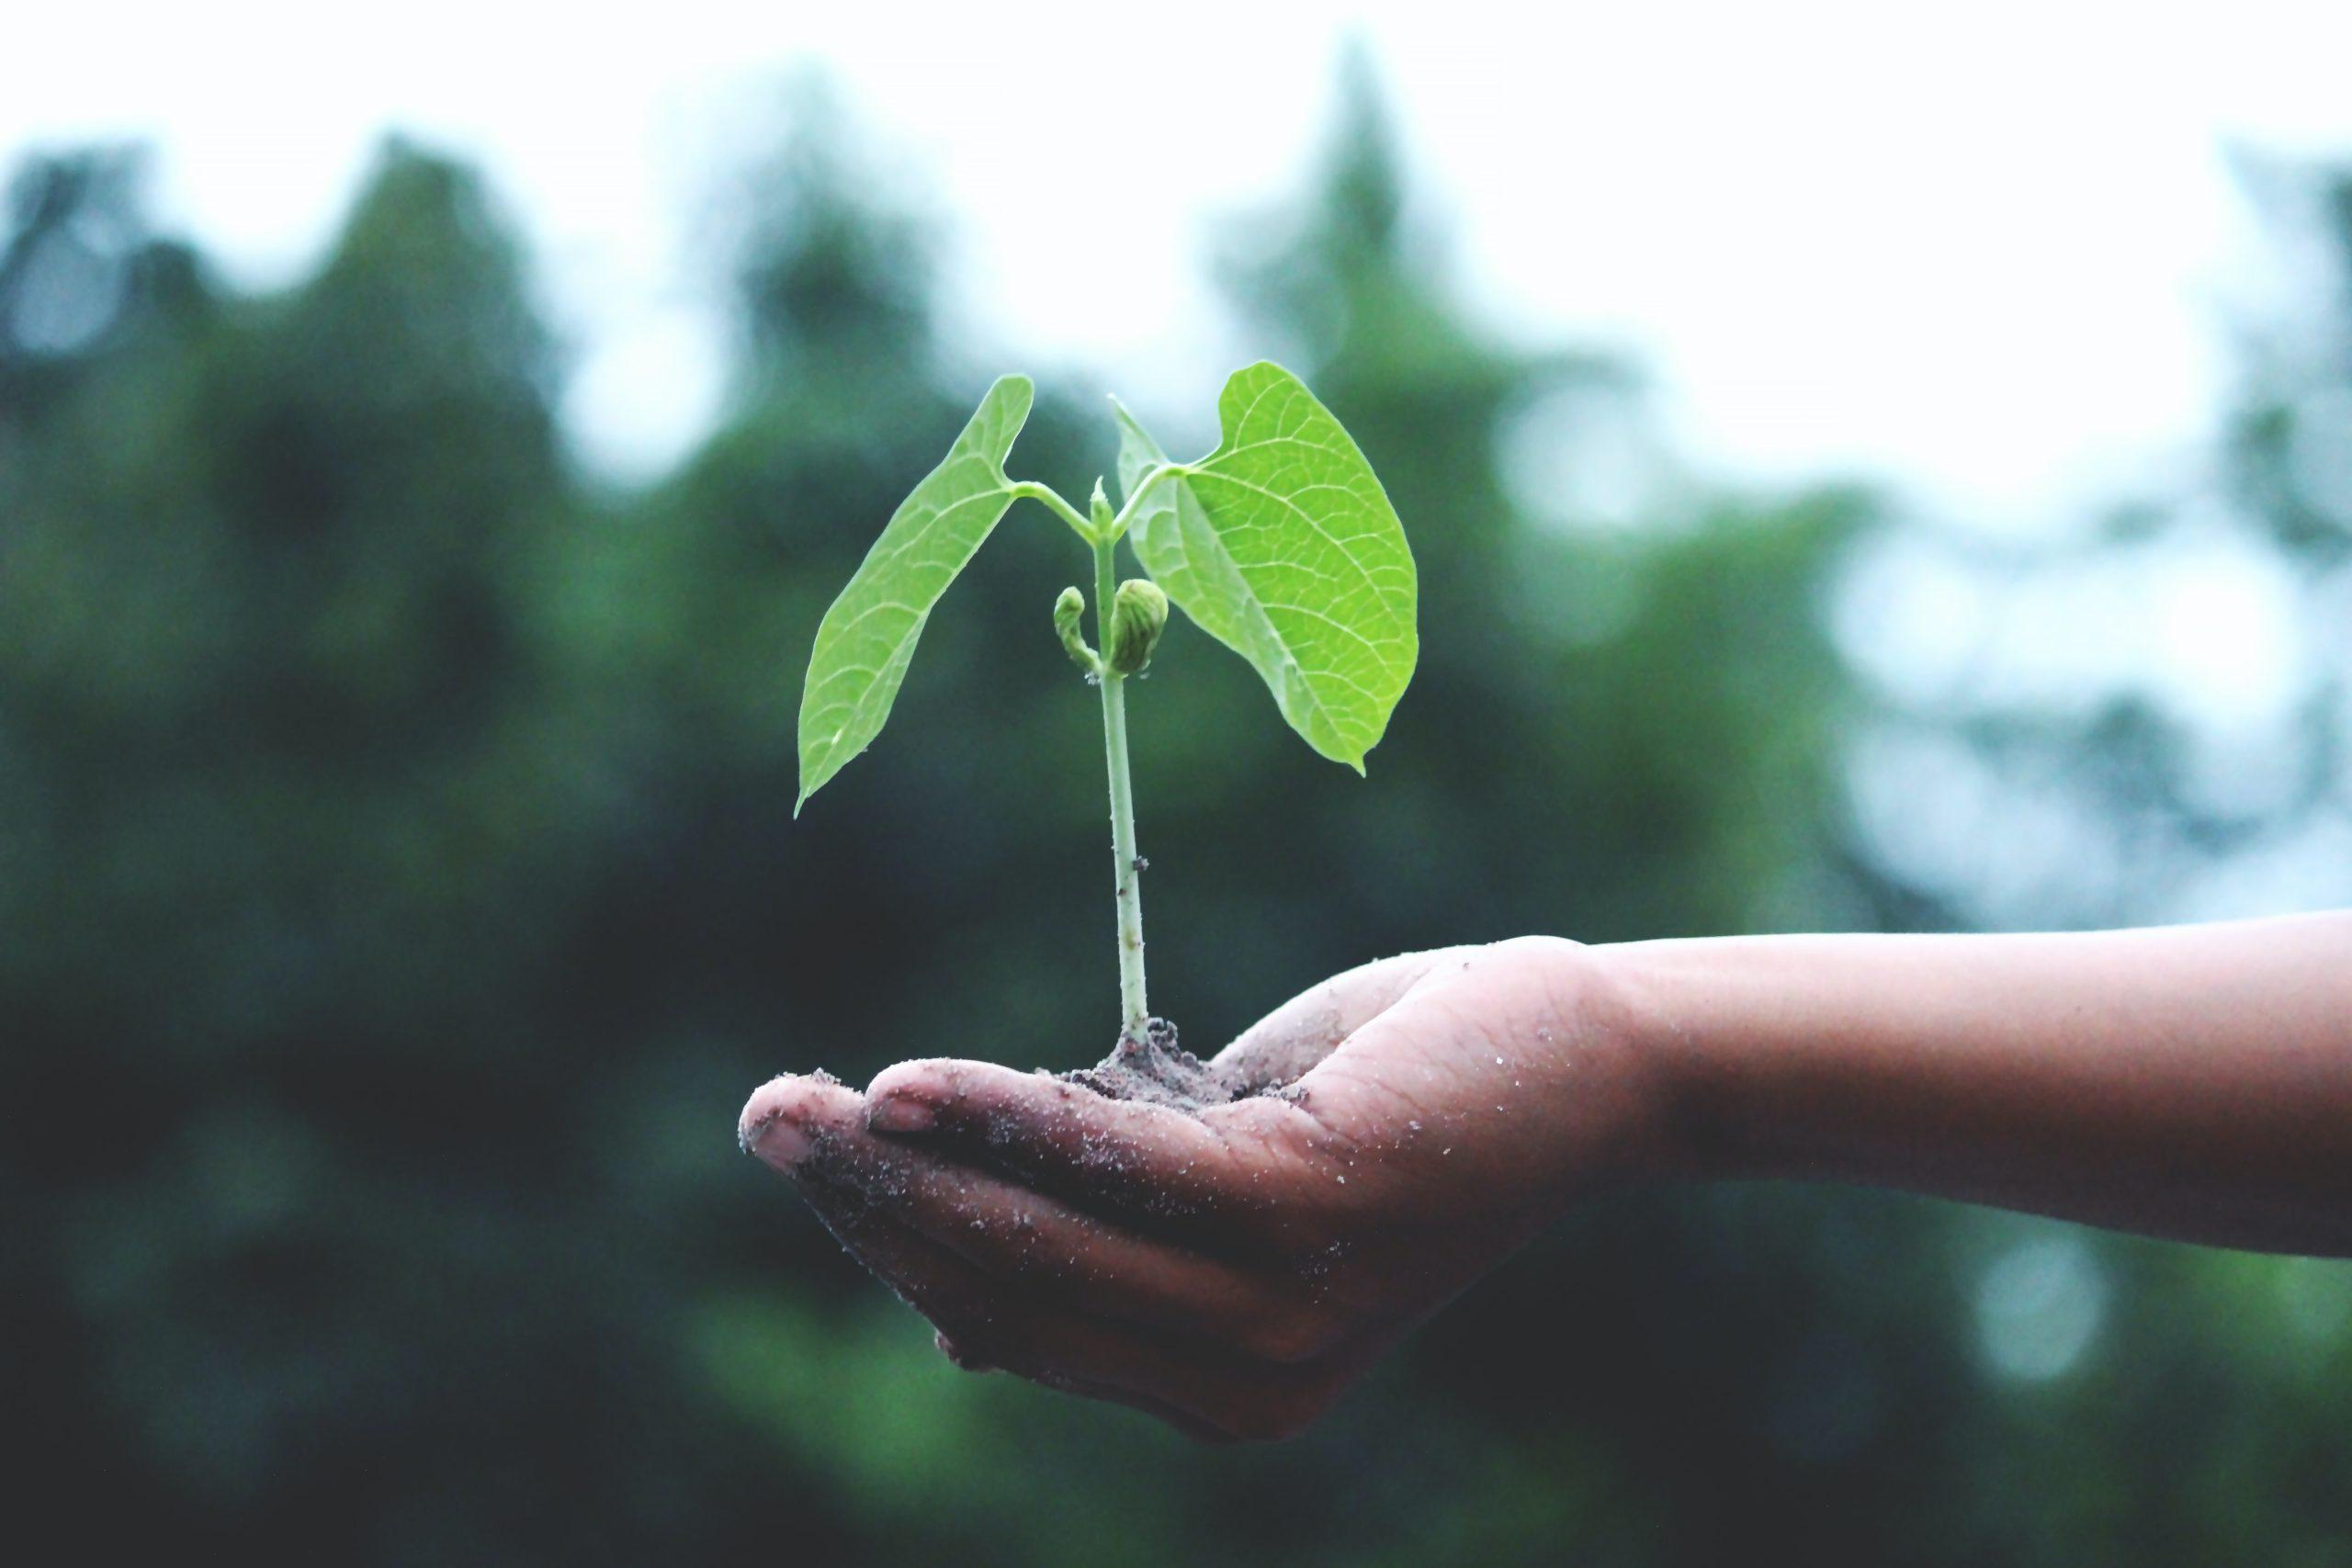 Ilustracja rosnąca roślina na dłoni